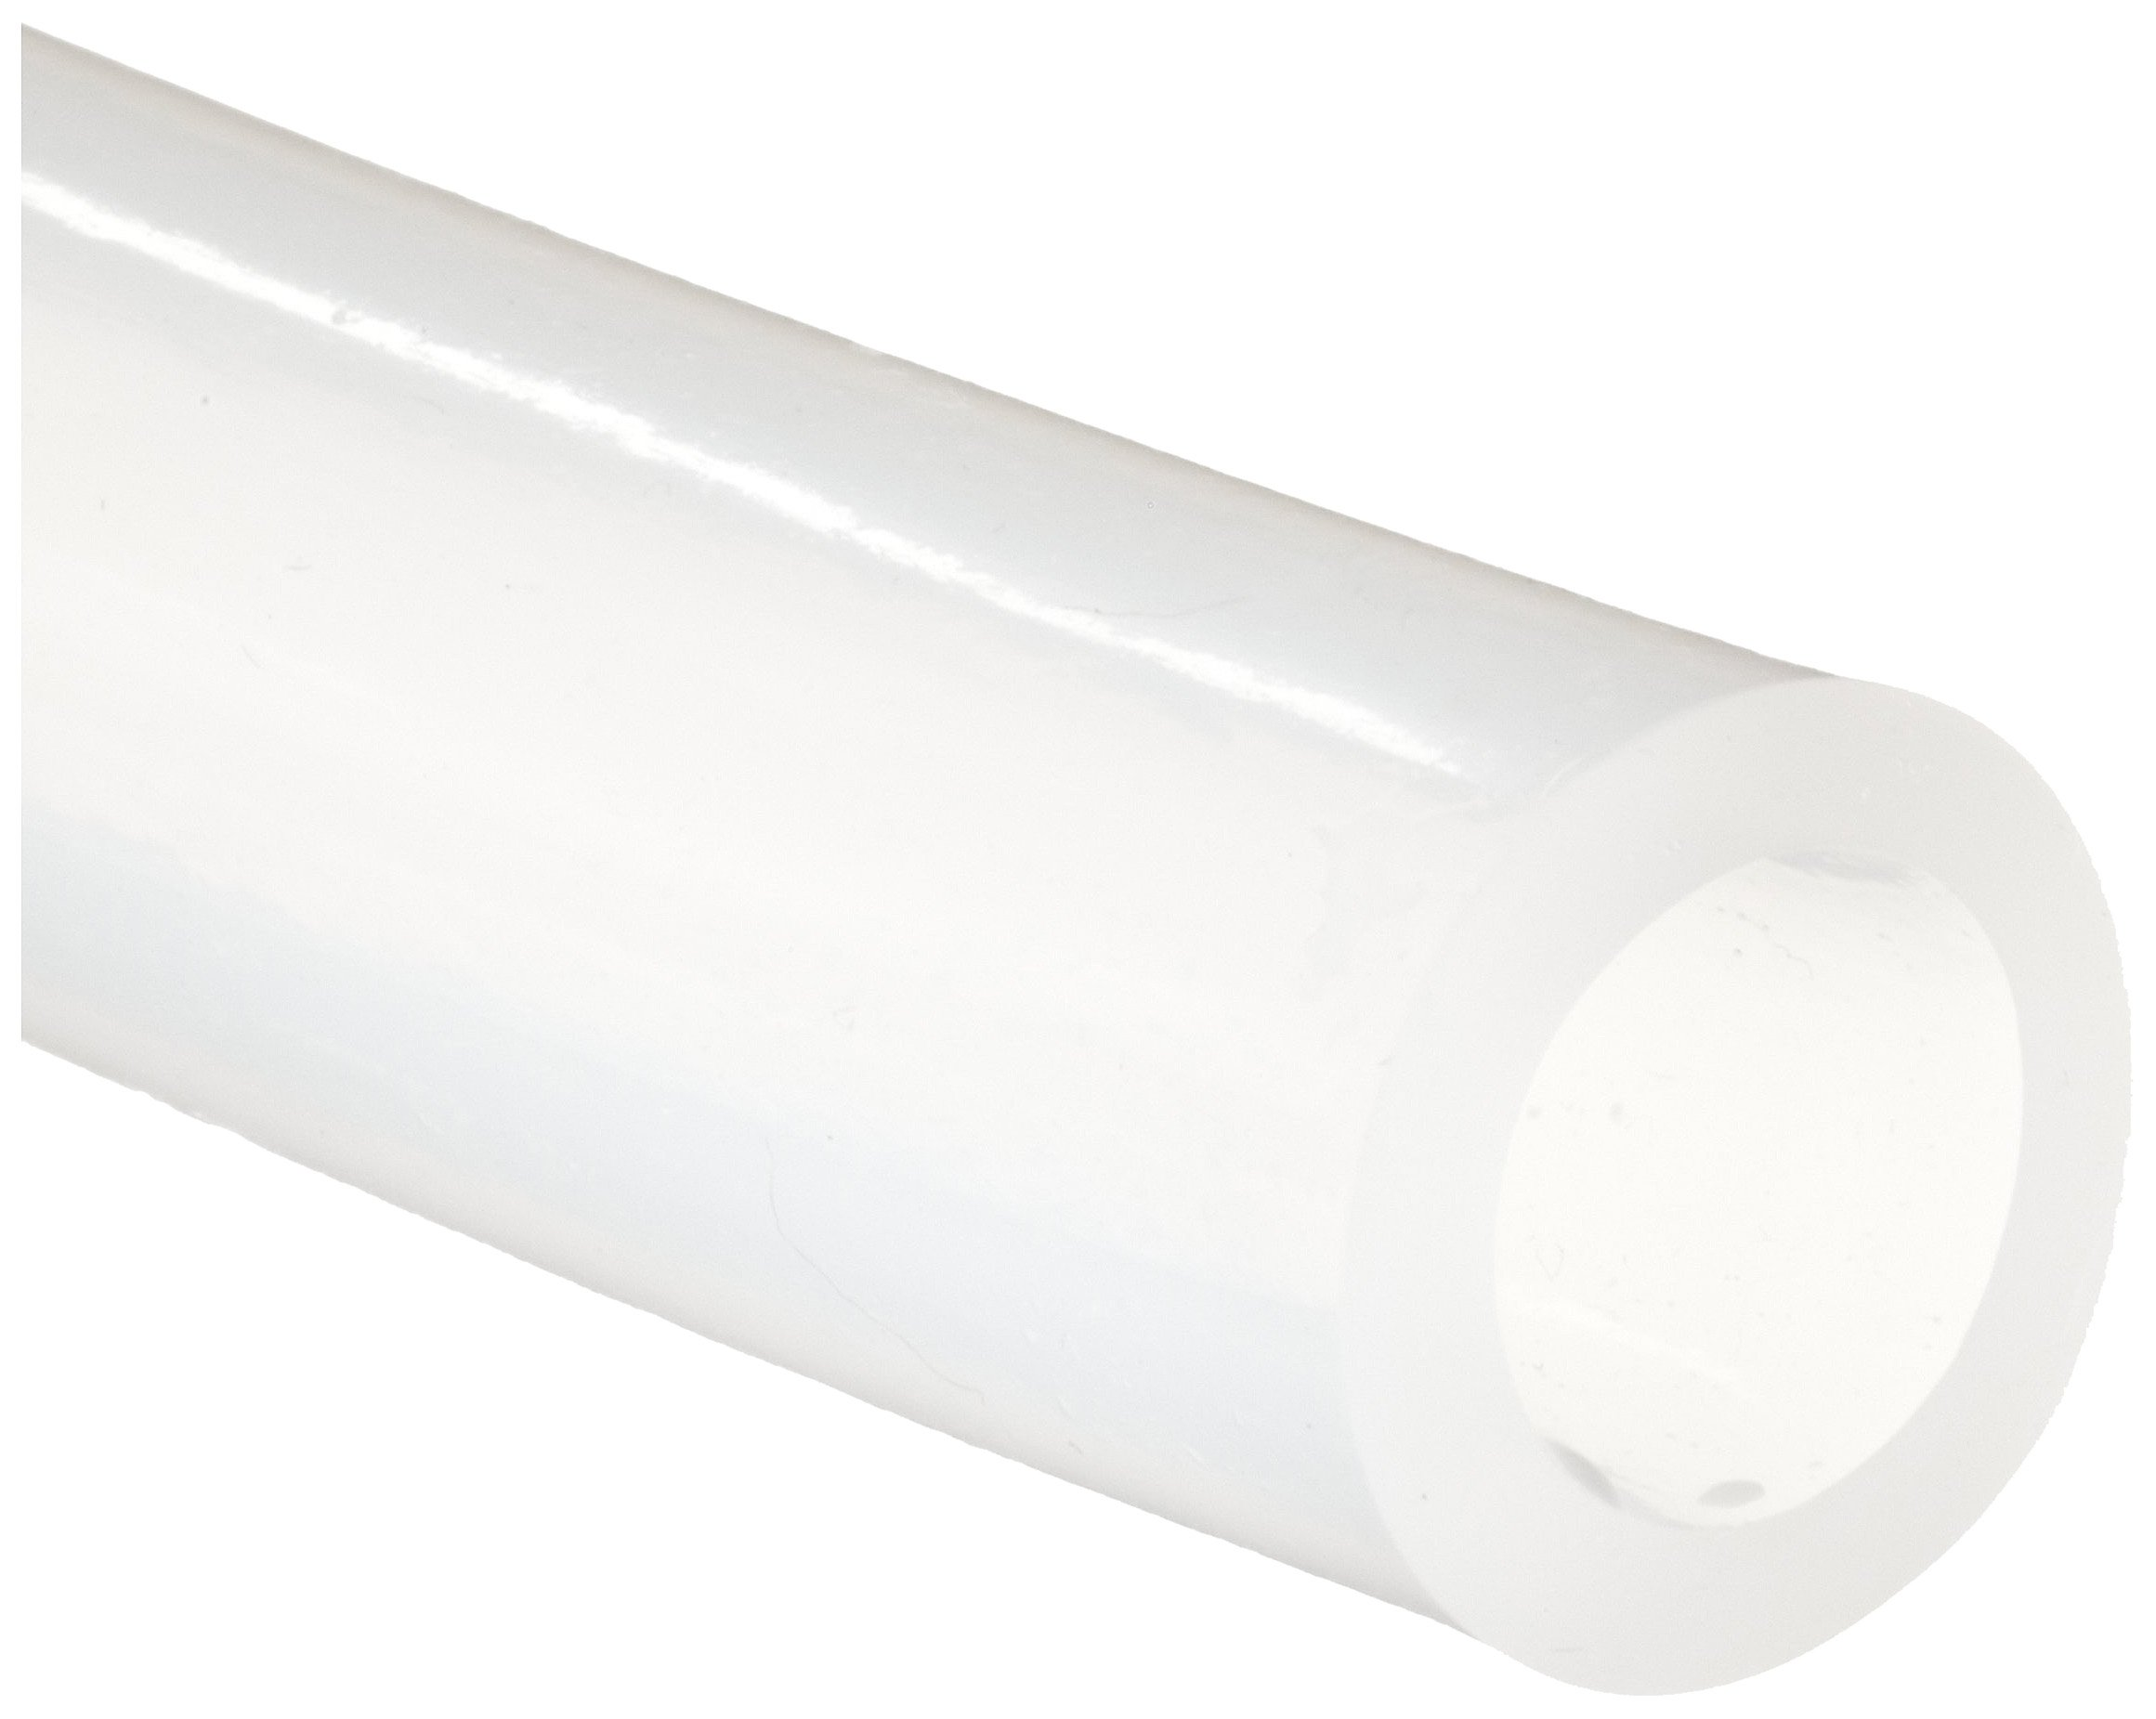 White Translucent Medical Grade SiliconeTubing, 0.625'' ID, 0.875'' OD, 0.125'' Wall, 25' Length